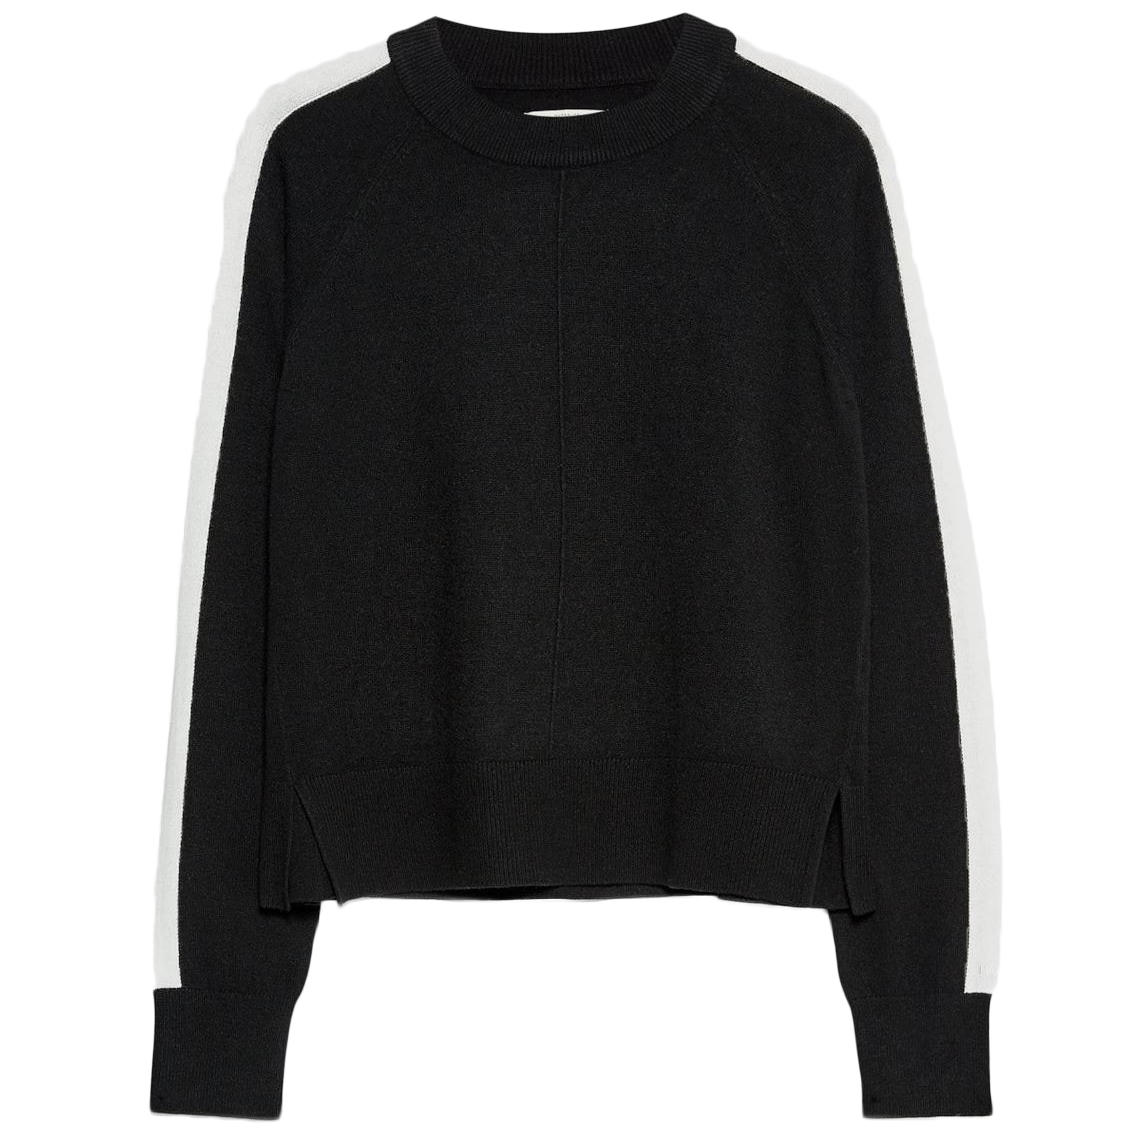 Jack Wills Women's Holyroyd Contrast Stripe Crewneck Sweater - Black, 10